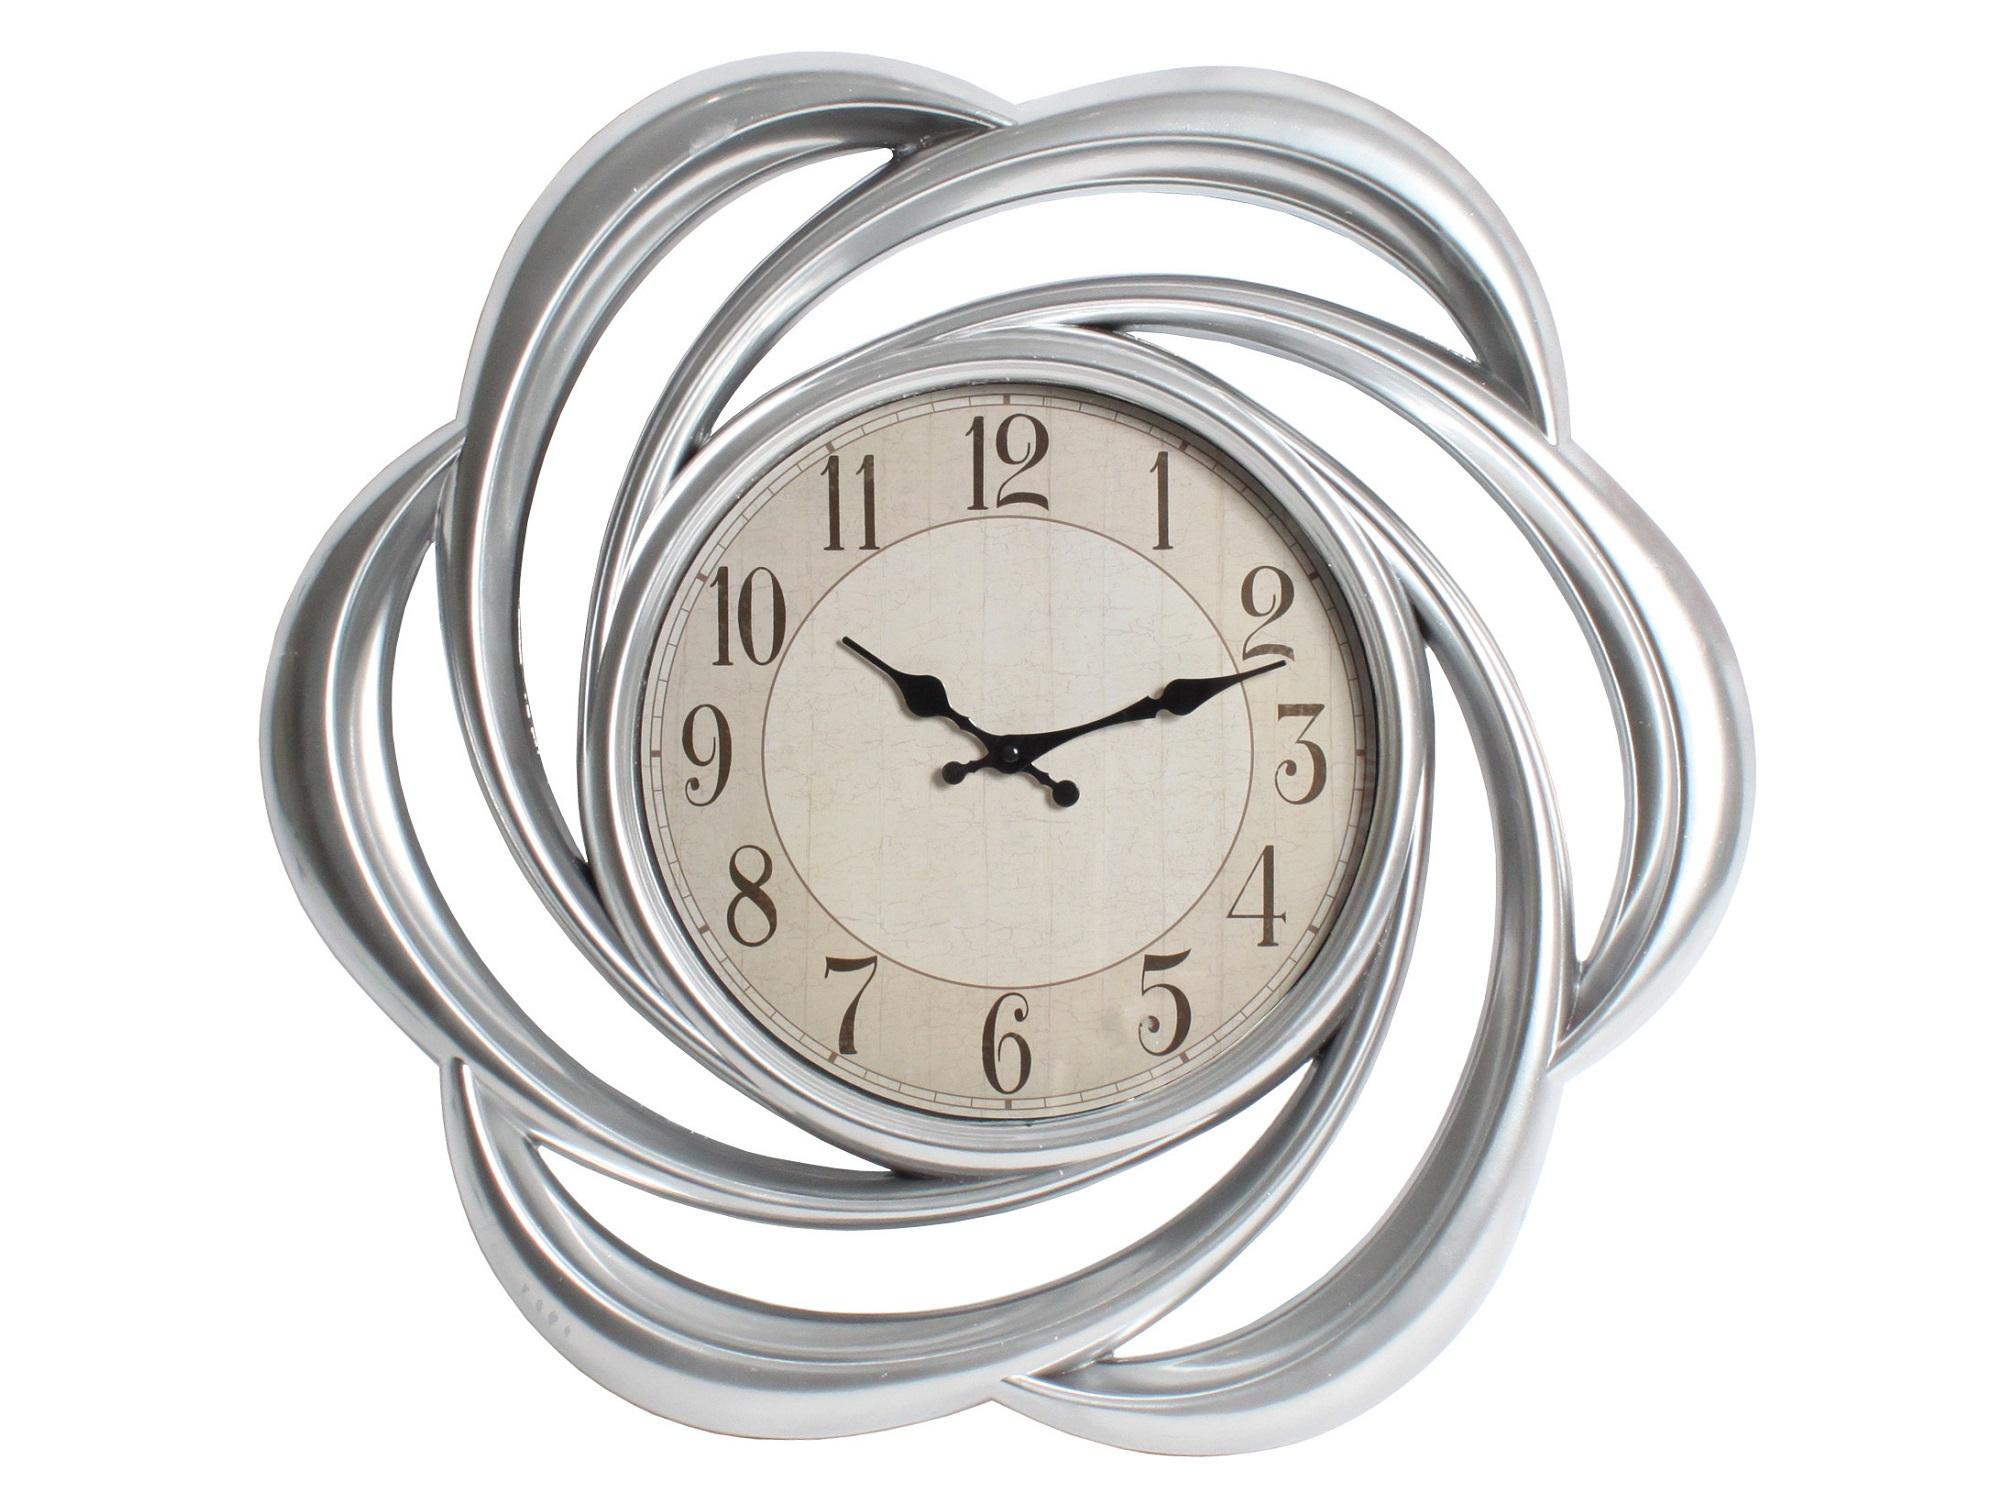 Часы настенные To4rooms 16411230 от thefurnish